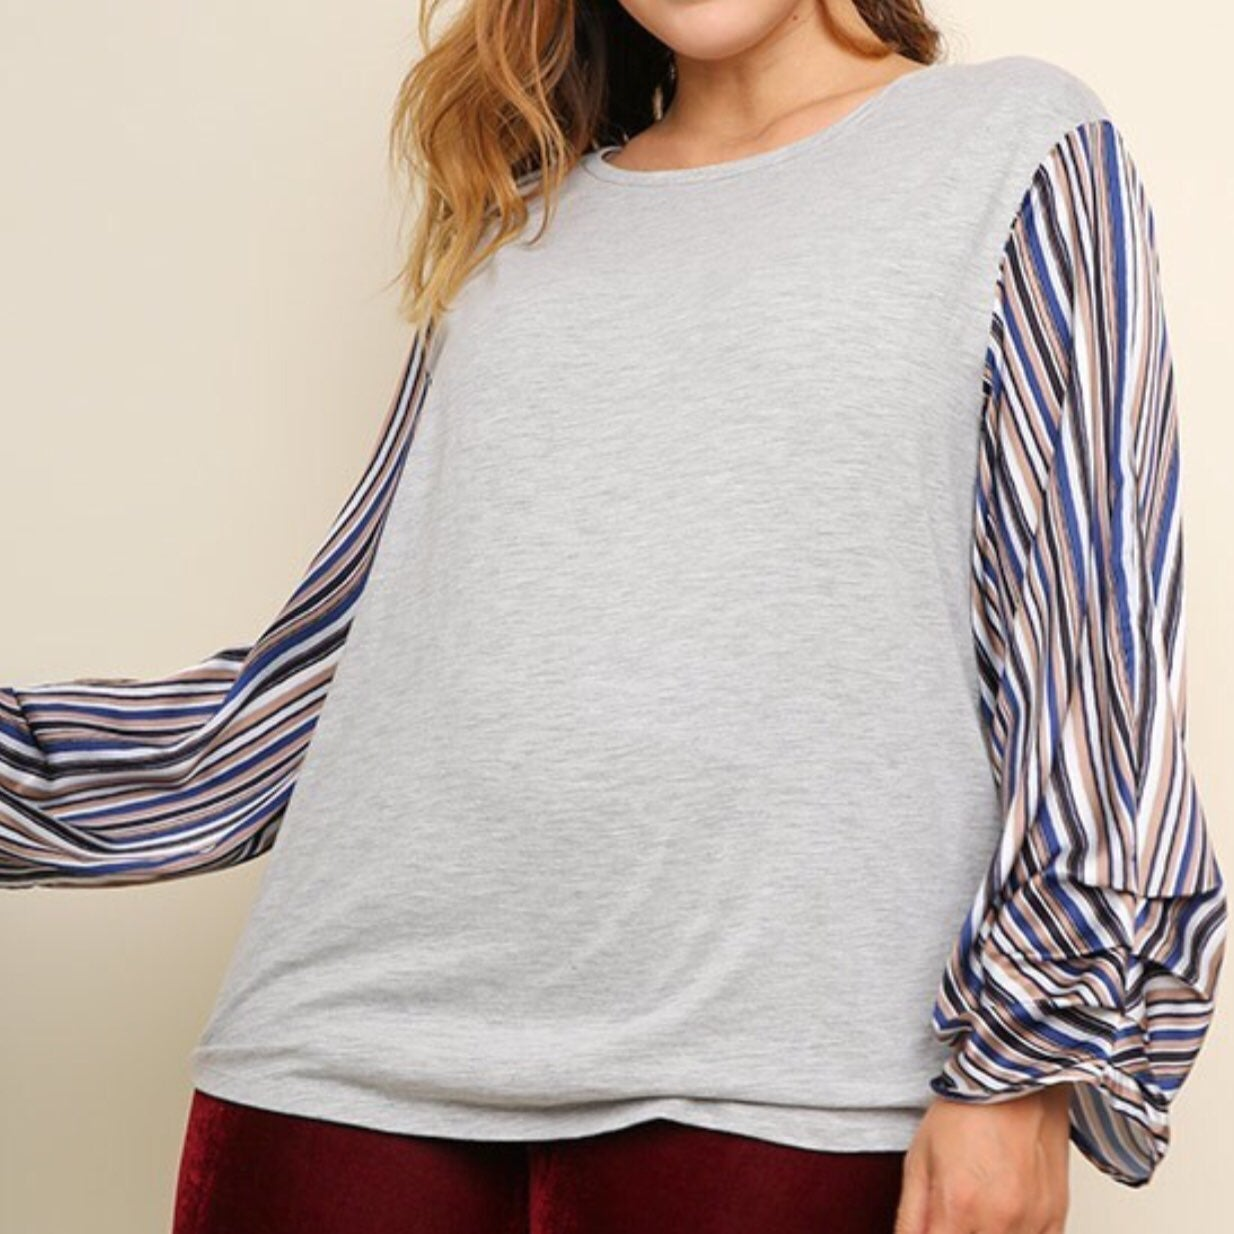 Umgee Gray Striped Sleeve Top, 2X